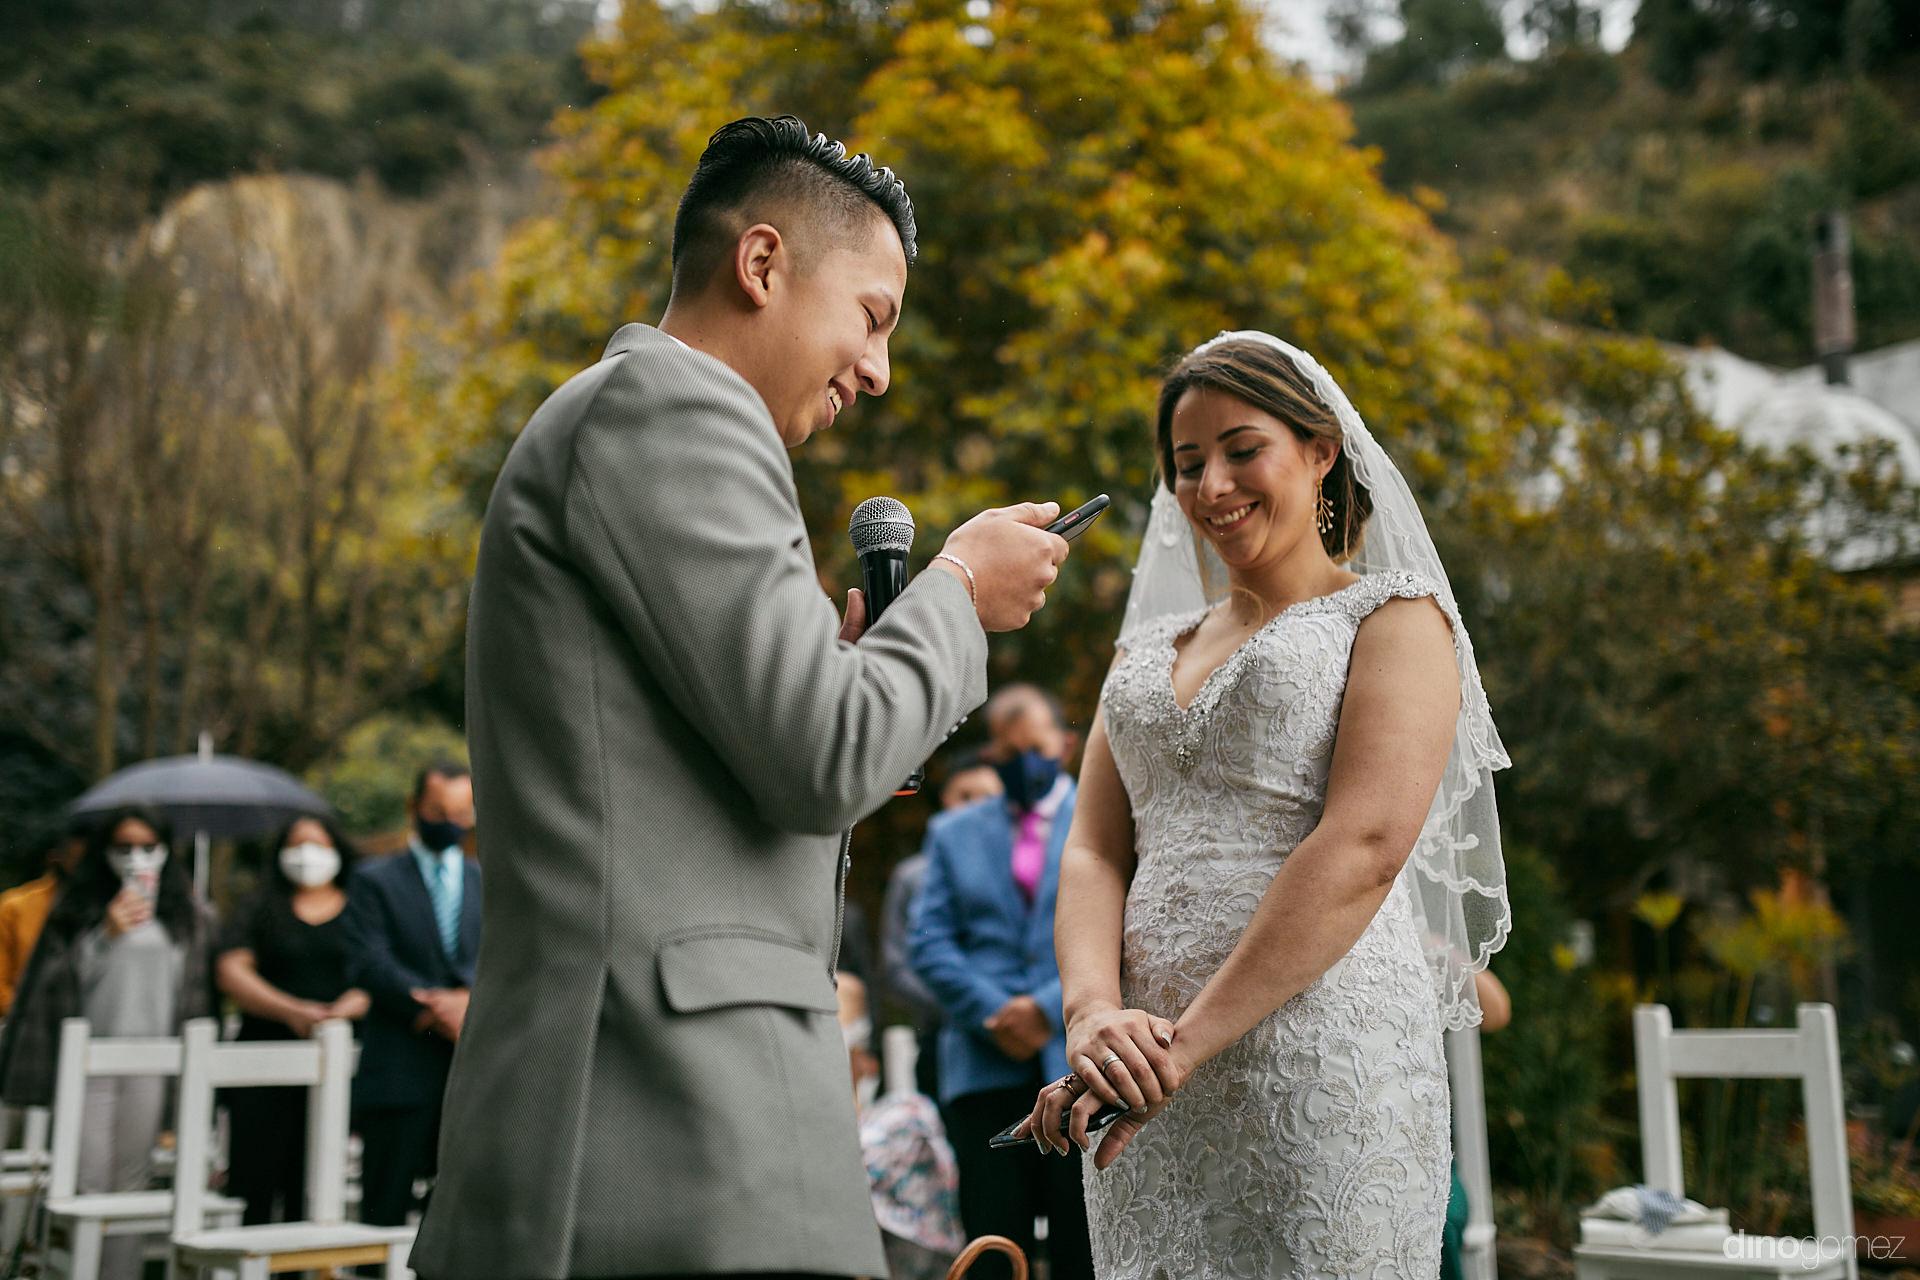 037 - Diy Budget Destination Weddings Can Be Prety Too!